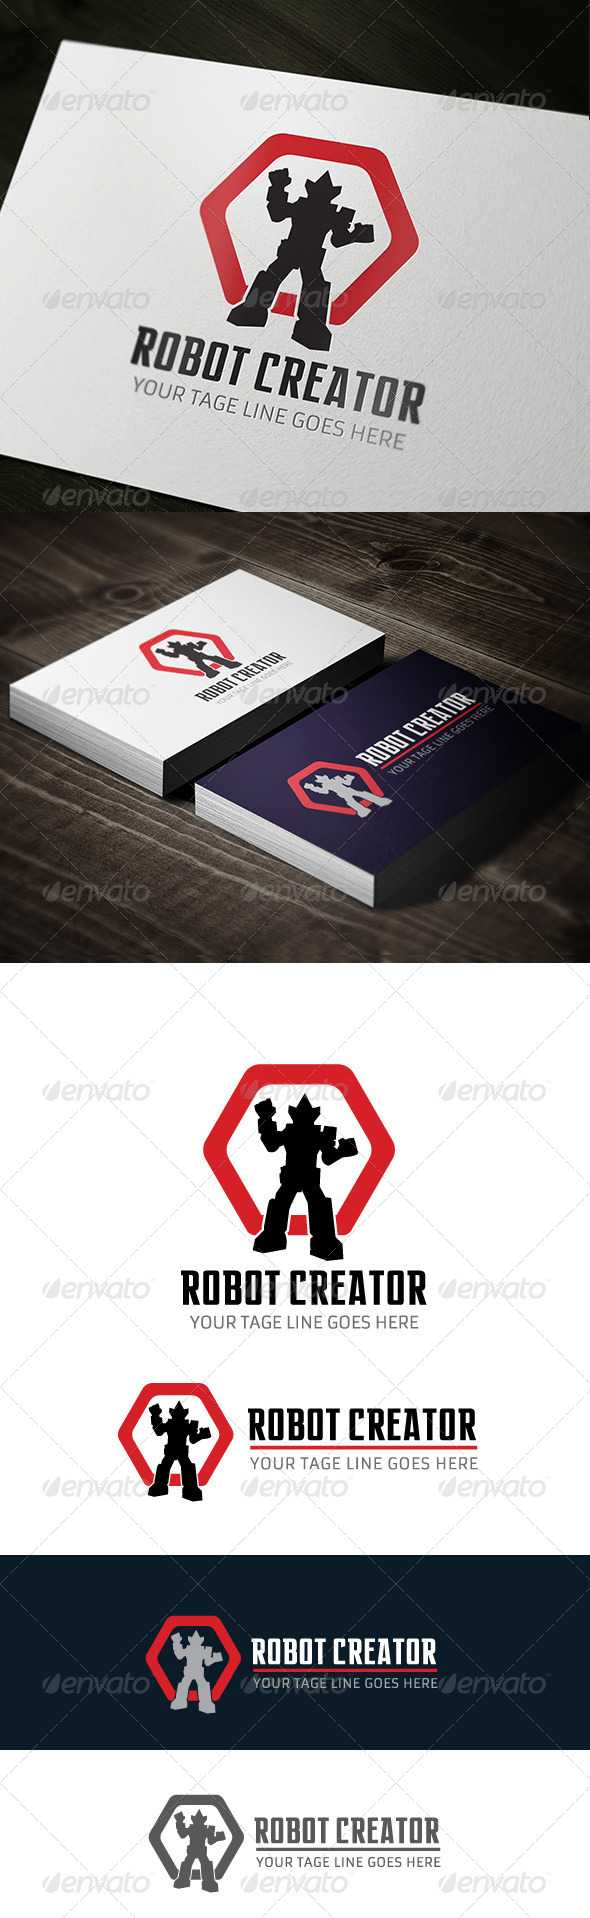 GraphicRiver Robot Creator 7513414